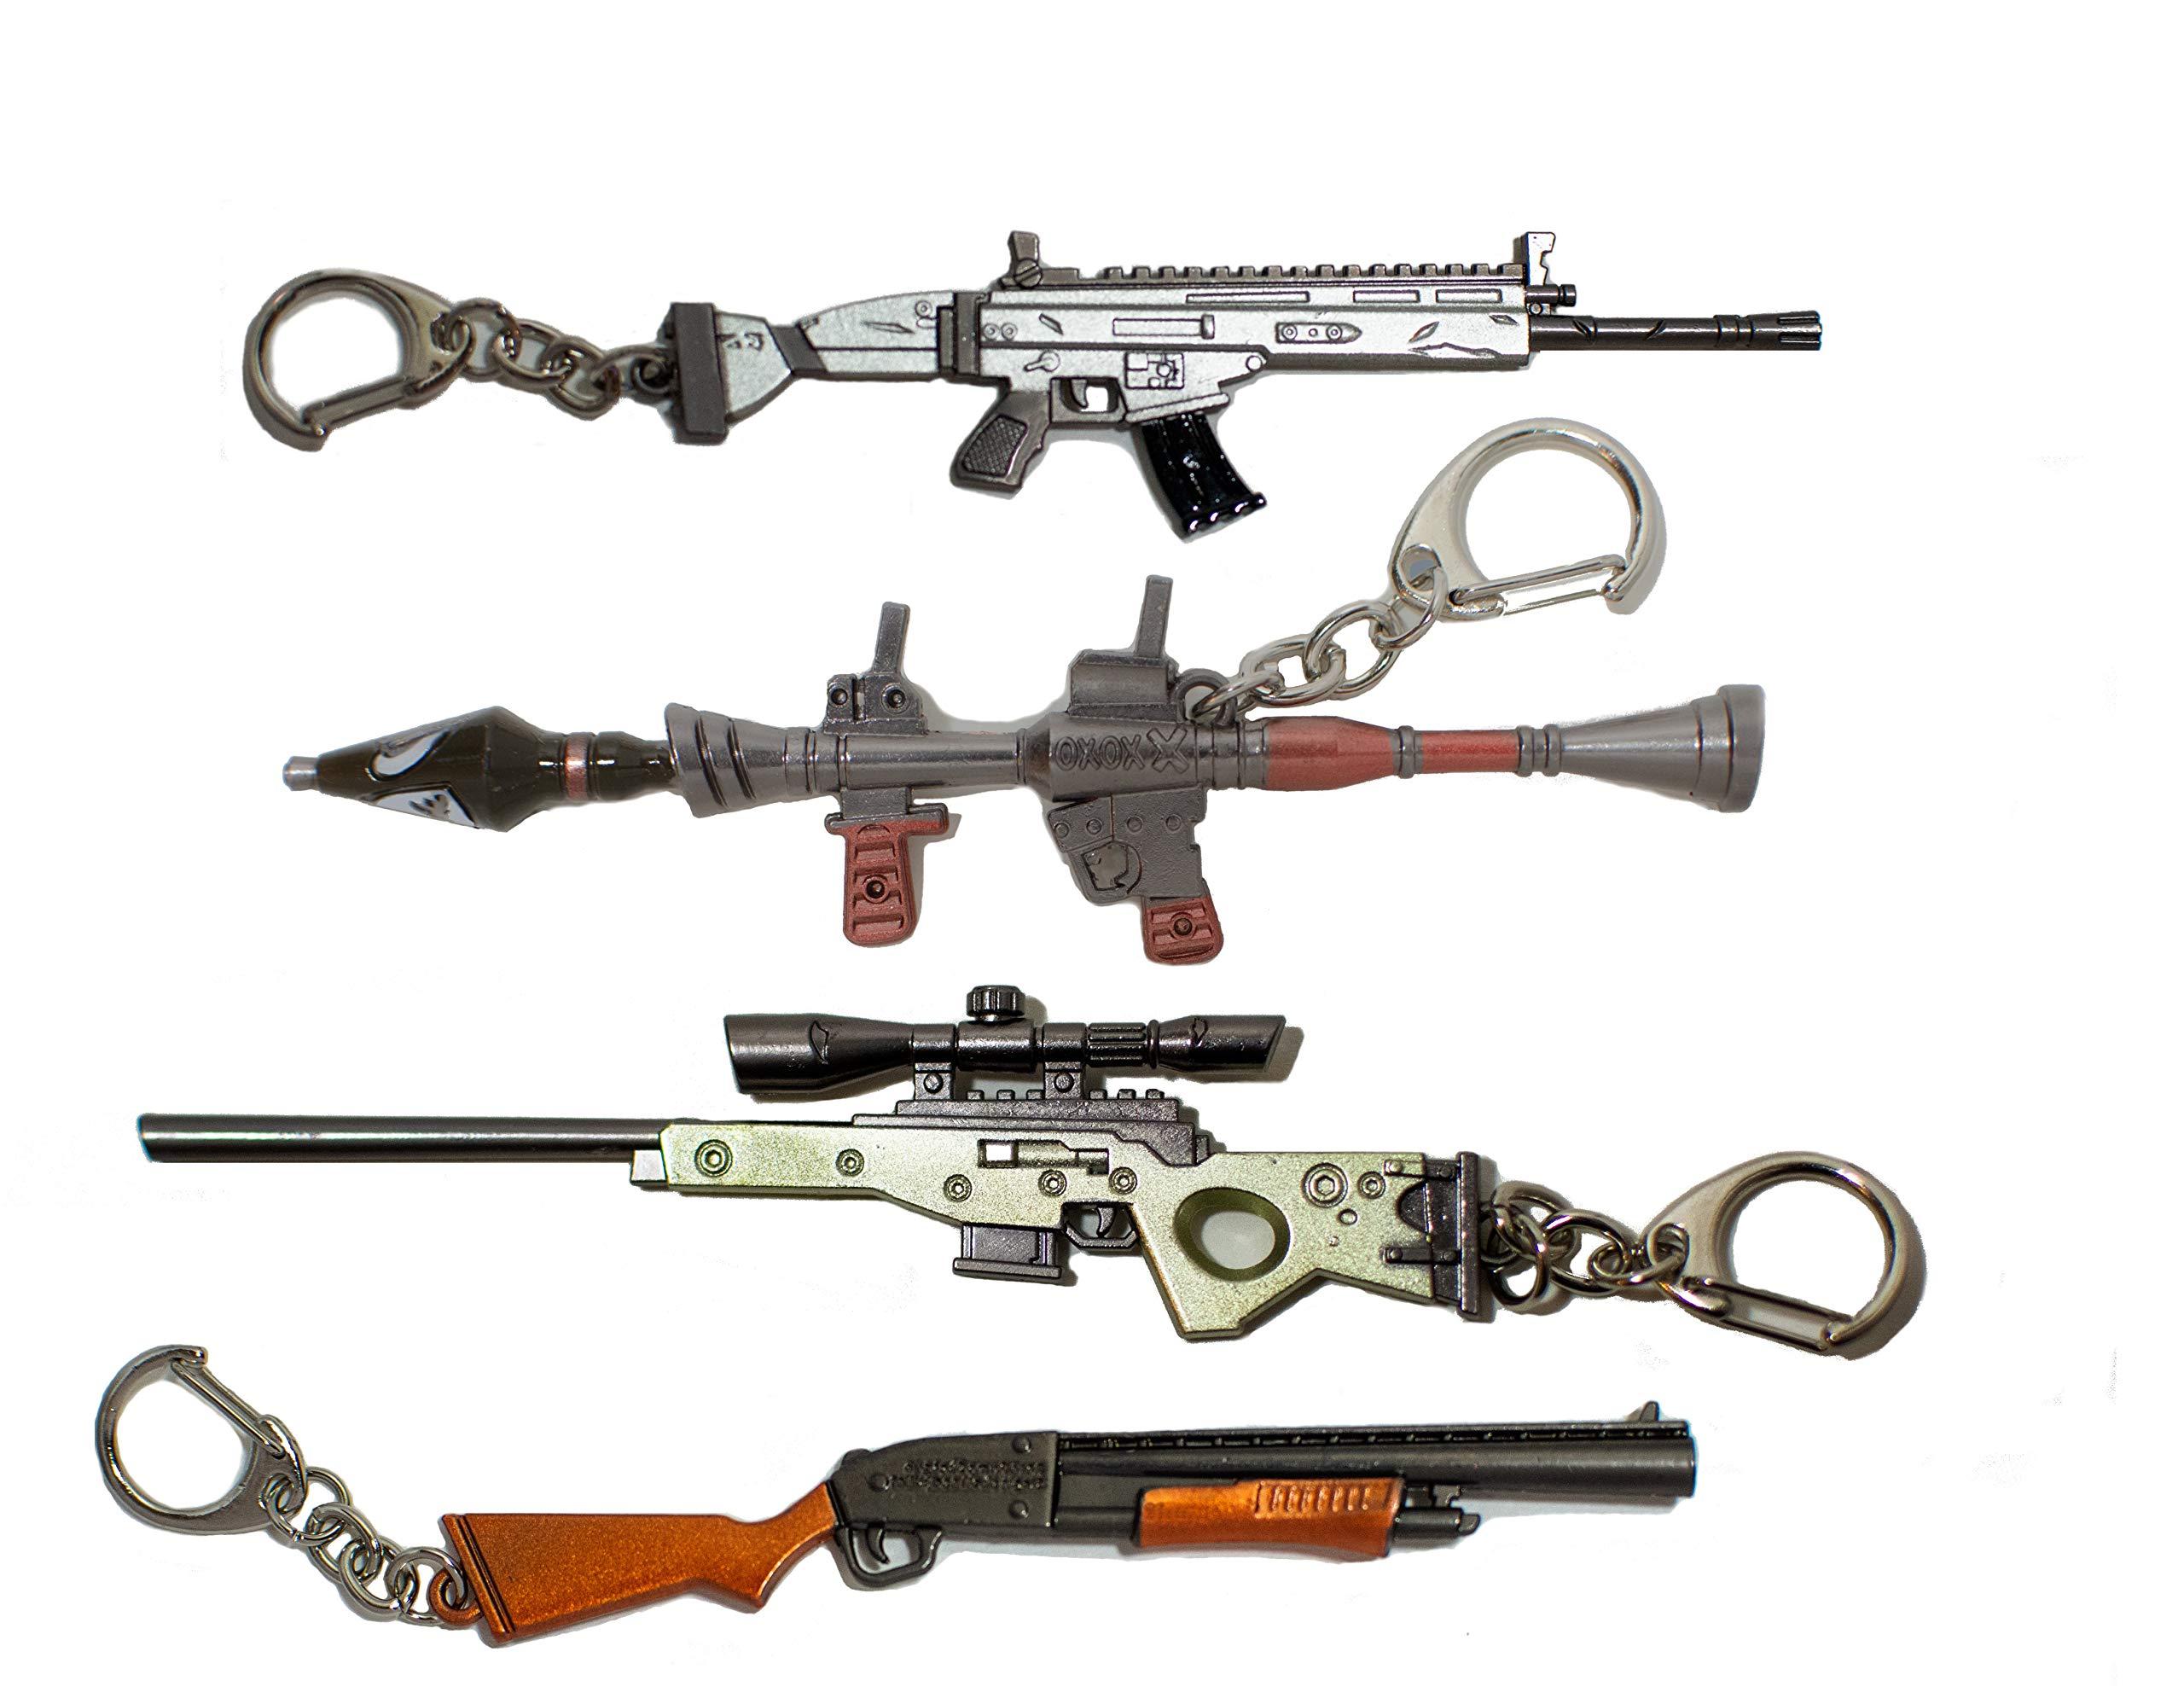 Victory Royale Gamer 钥匙链枪狙击枪泵 SCAR 和火箭